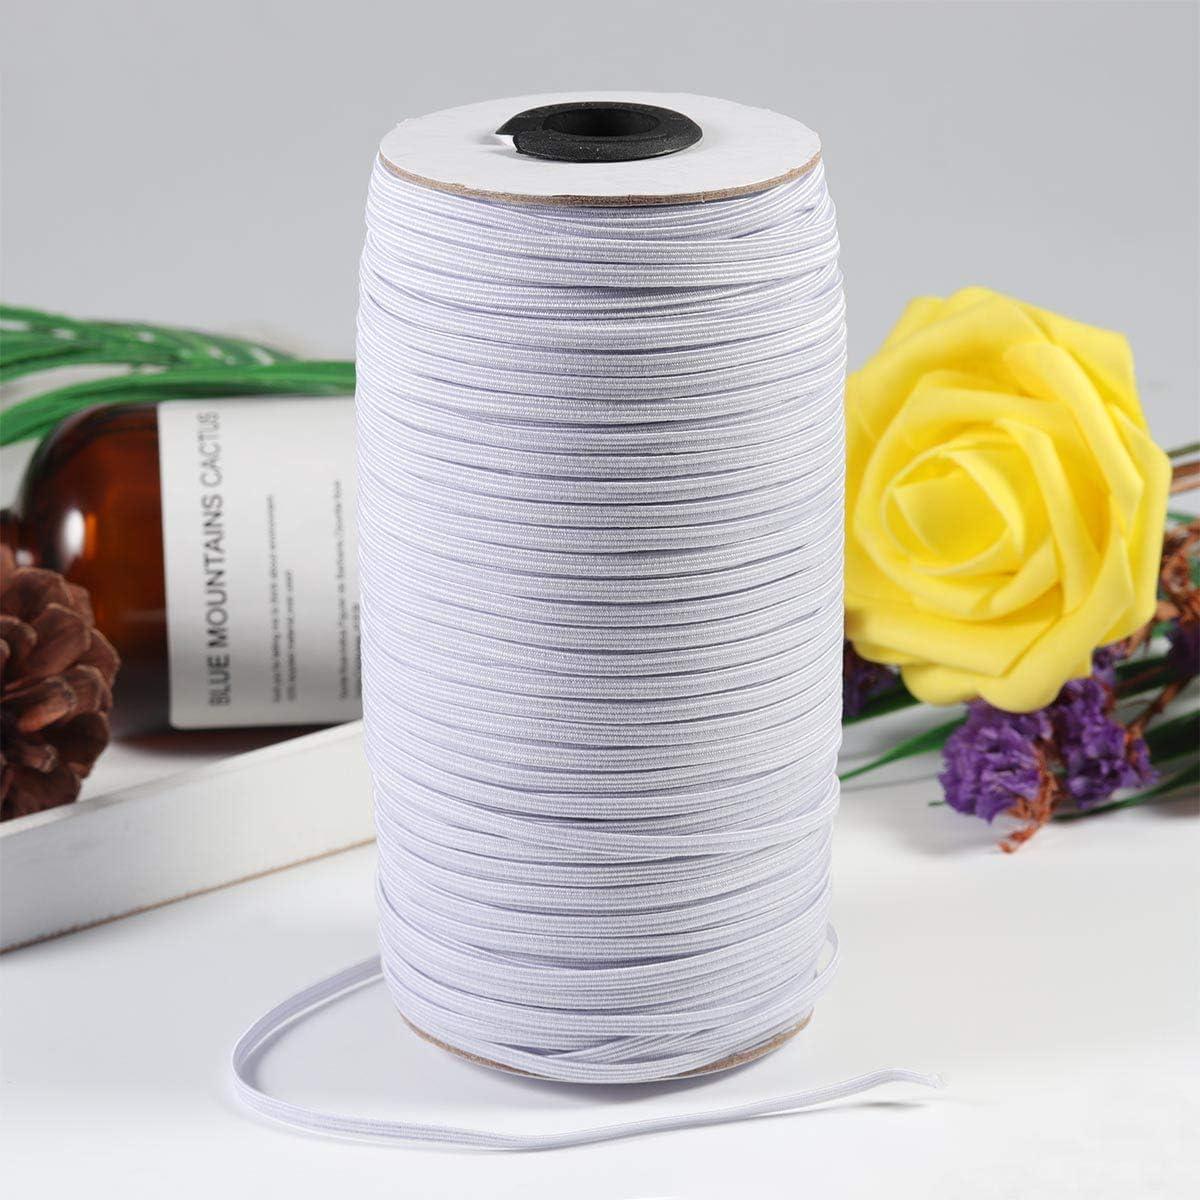 1//4 Chuyau 200-Yards White Braided Elastic Cord Elastic Bands for Sewing/Knit Heavy Stretch Elastic